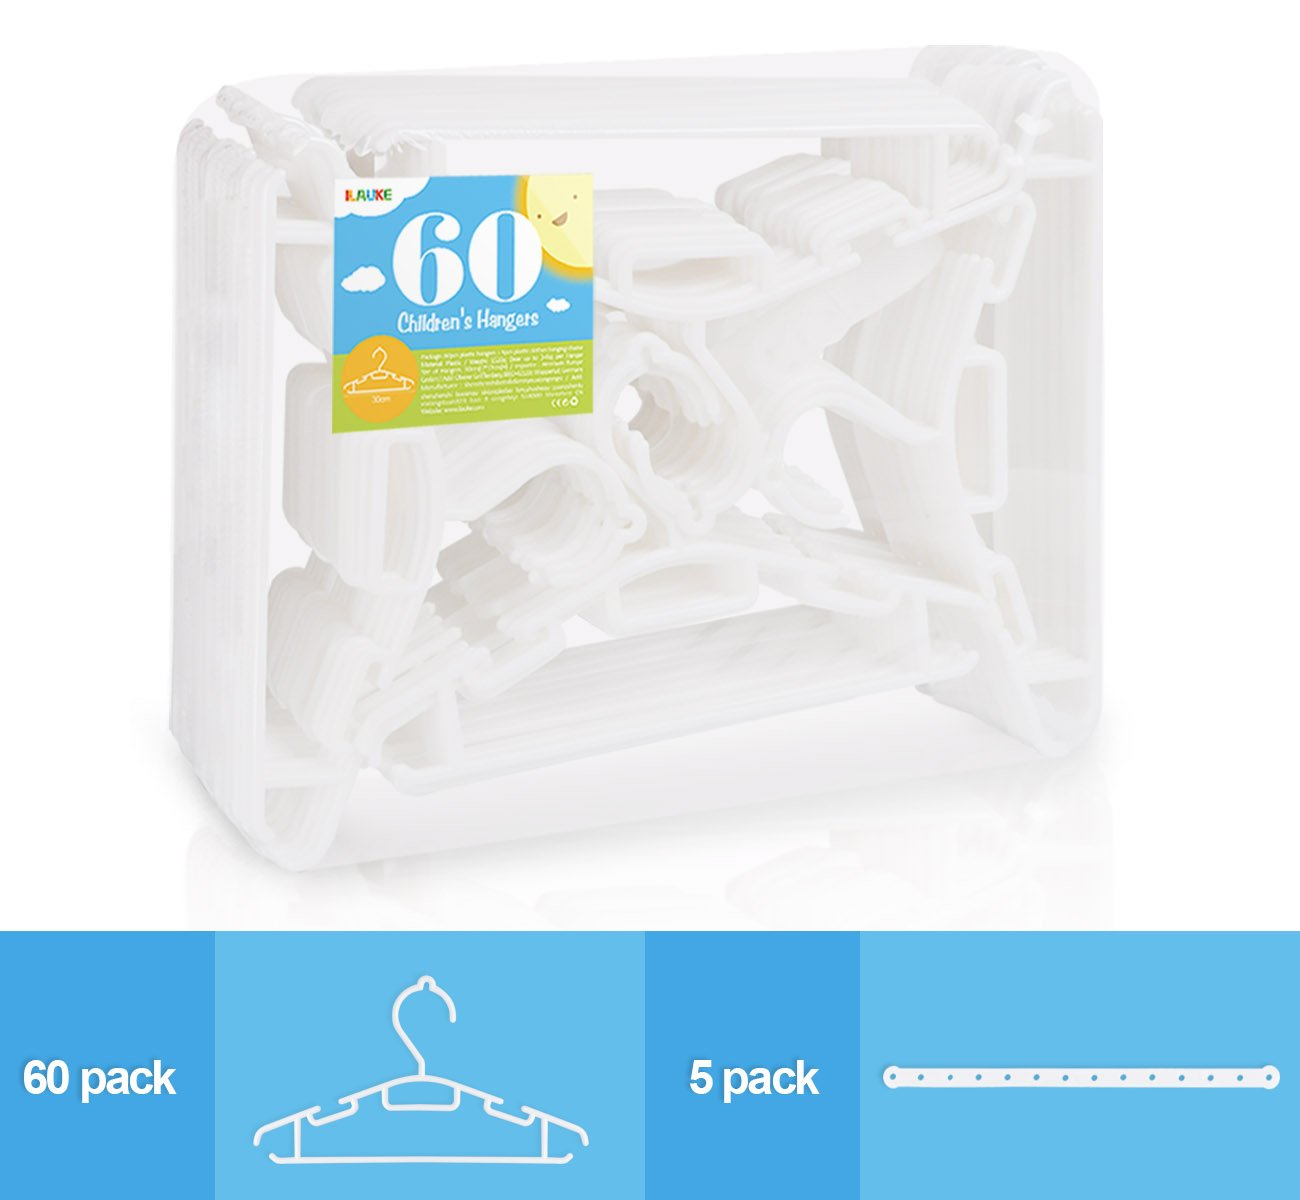 60 Pack Non-slip White Tubular Childrens Hangers 12 Inch for Kids Baby Infant Toddler with Plastic Hanger Straps by ilauke